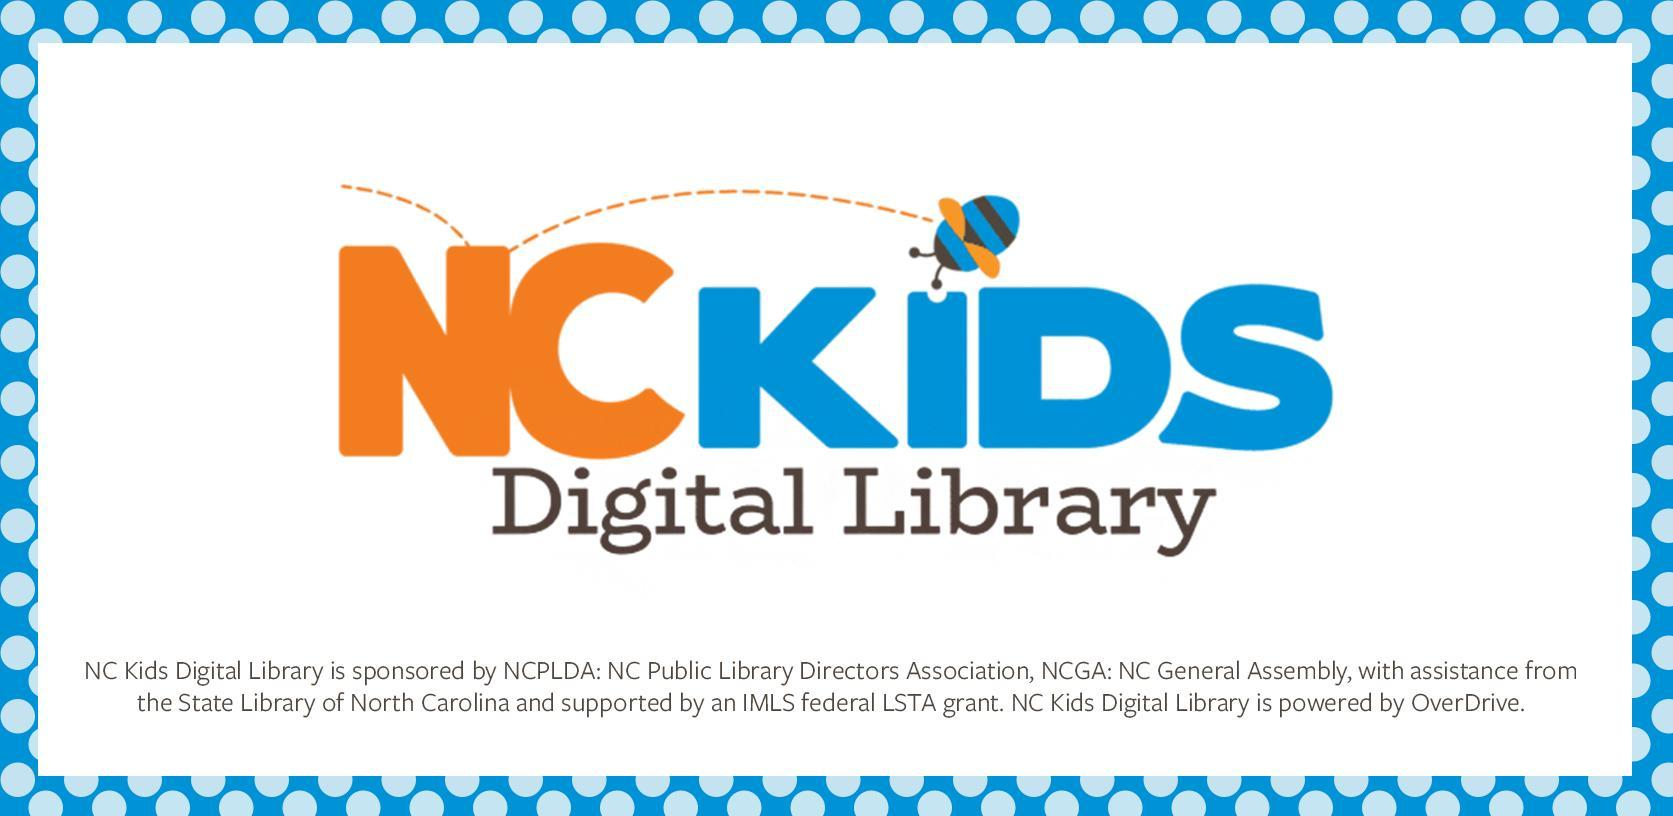 Digital Kids Library